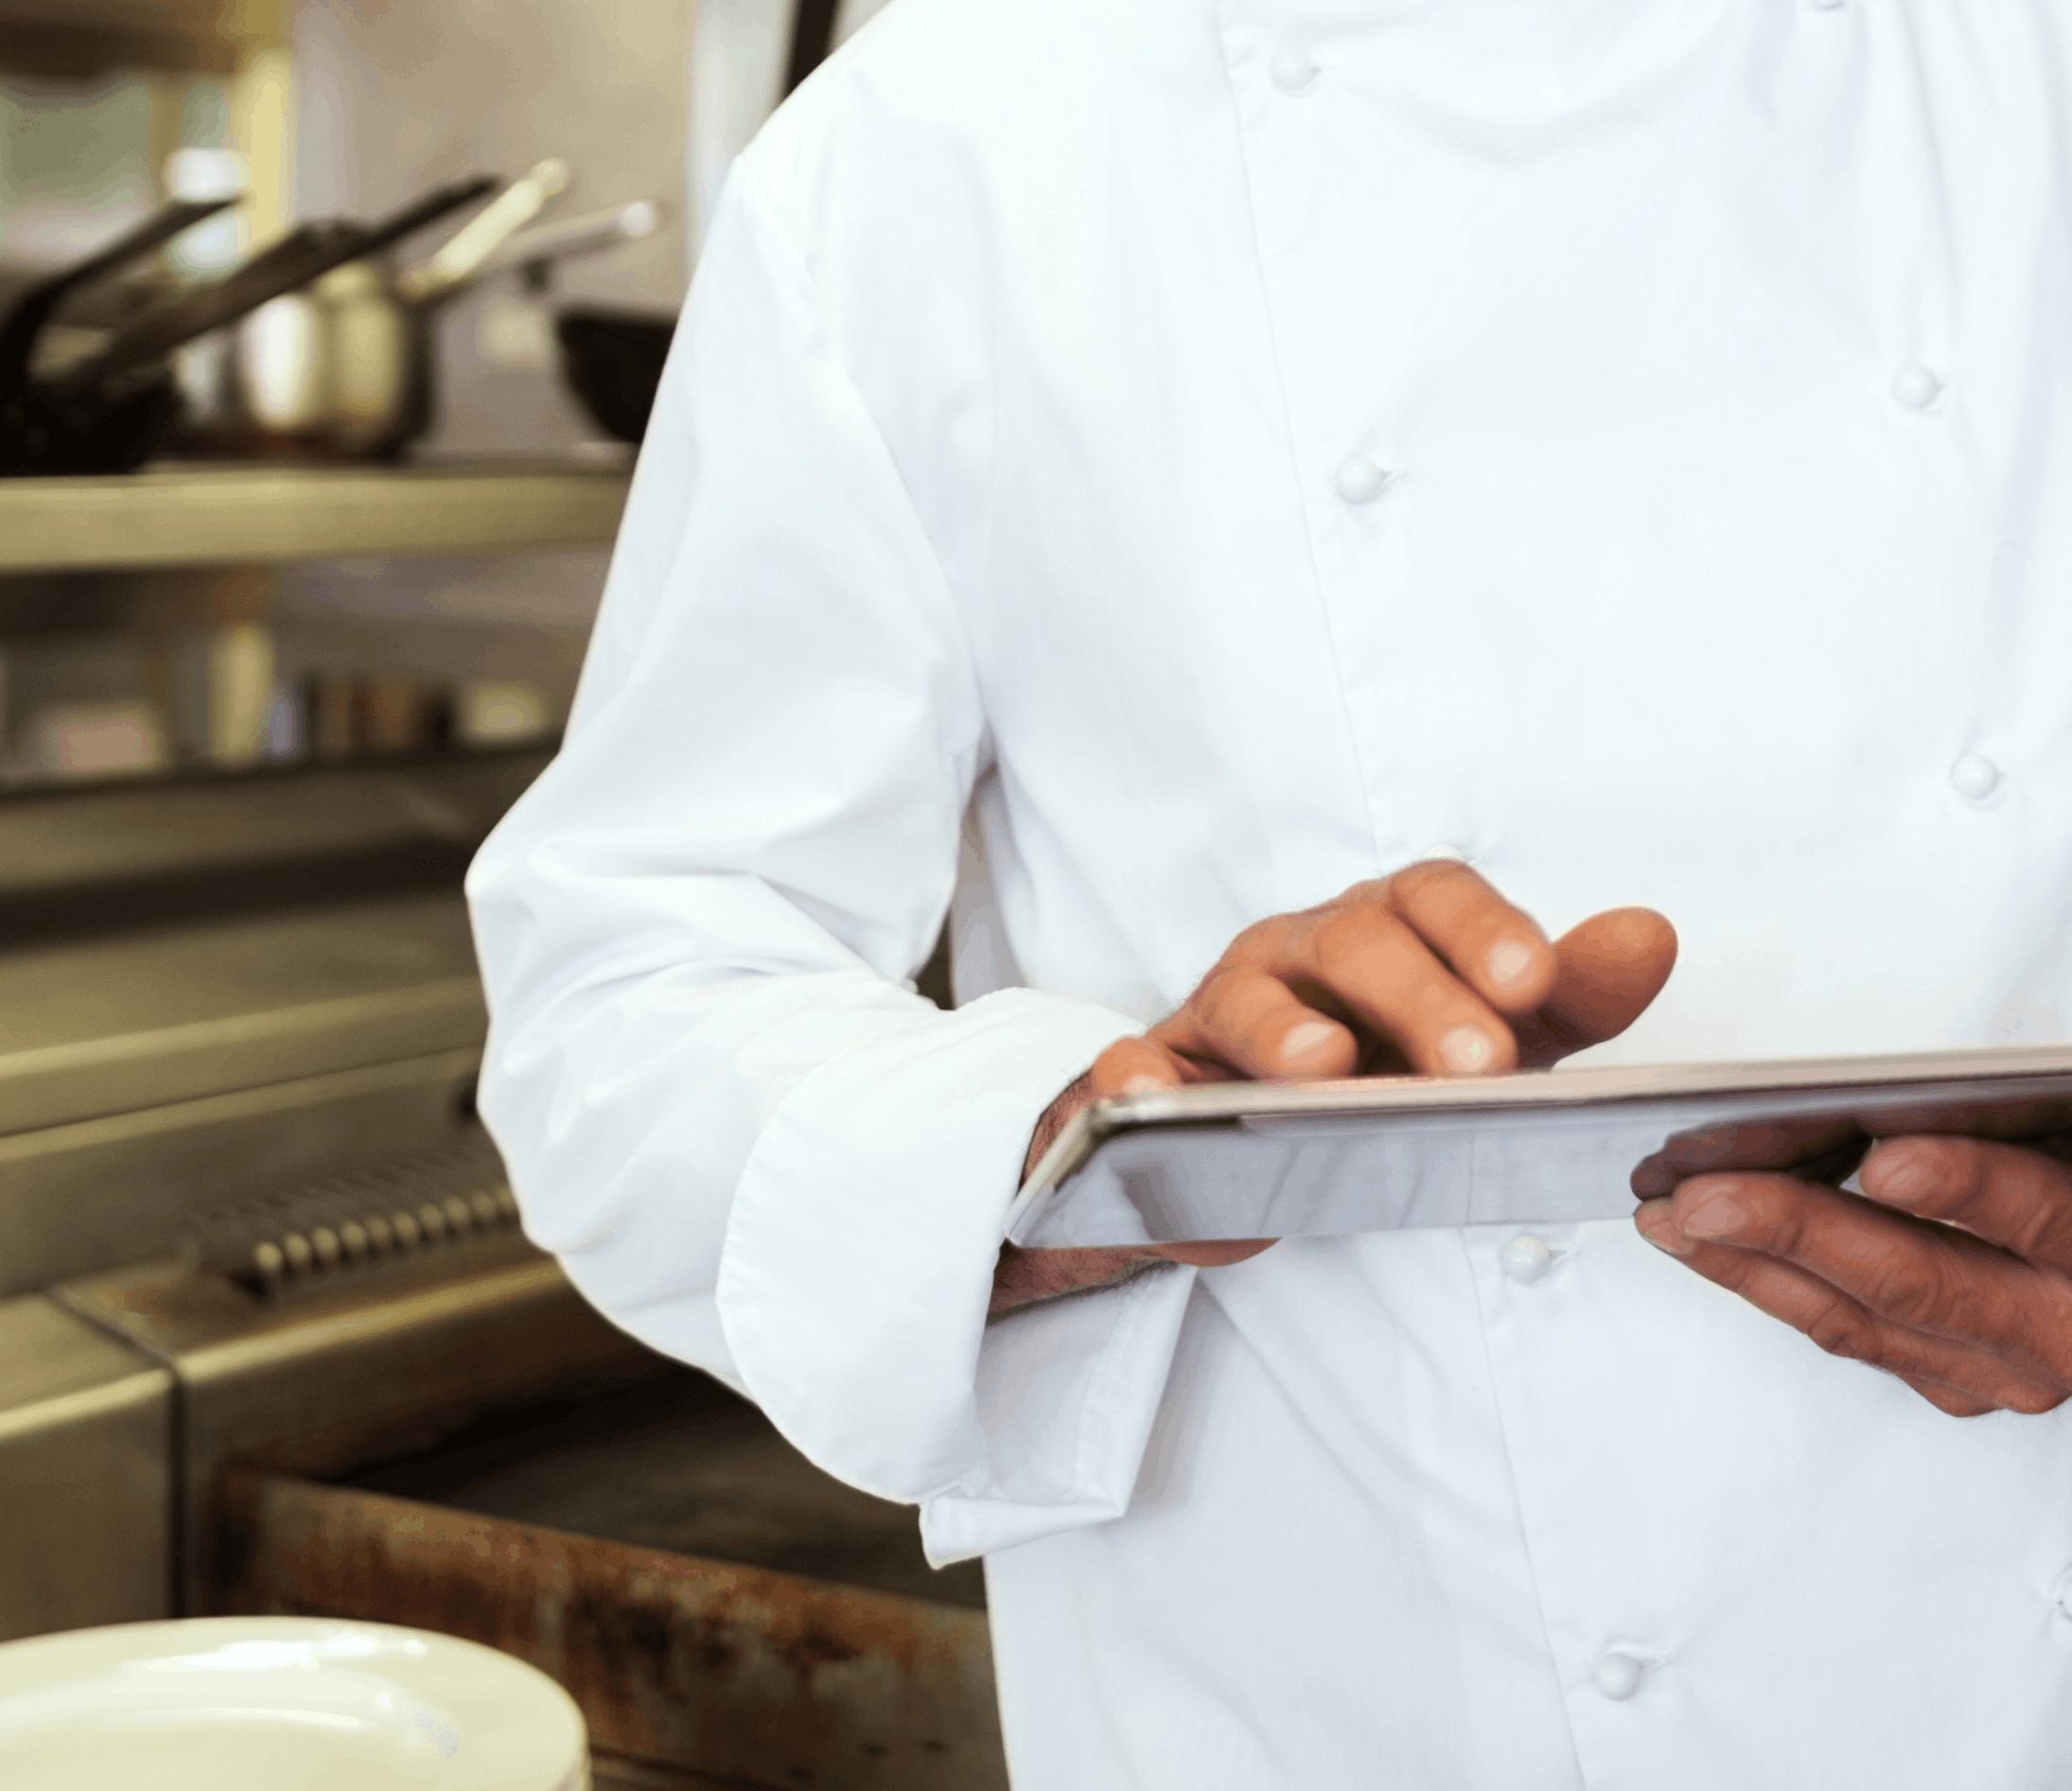 chef-adopting-technology-in-smartkitchens-kitchenplus-india